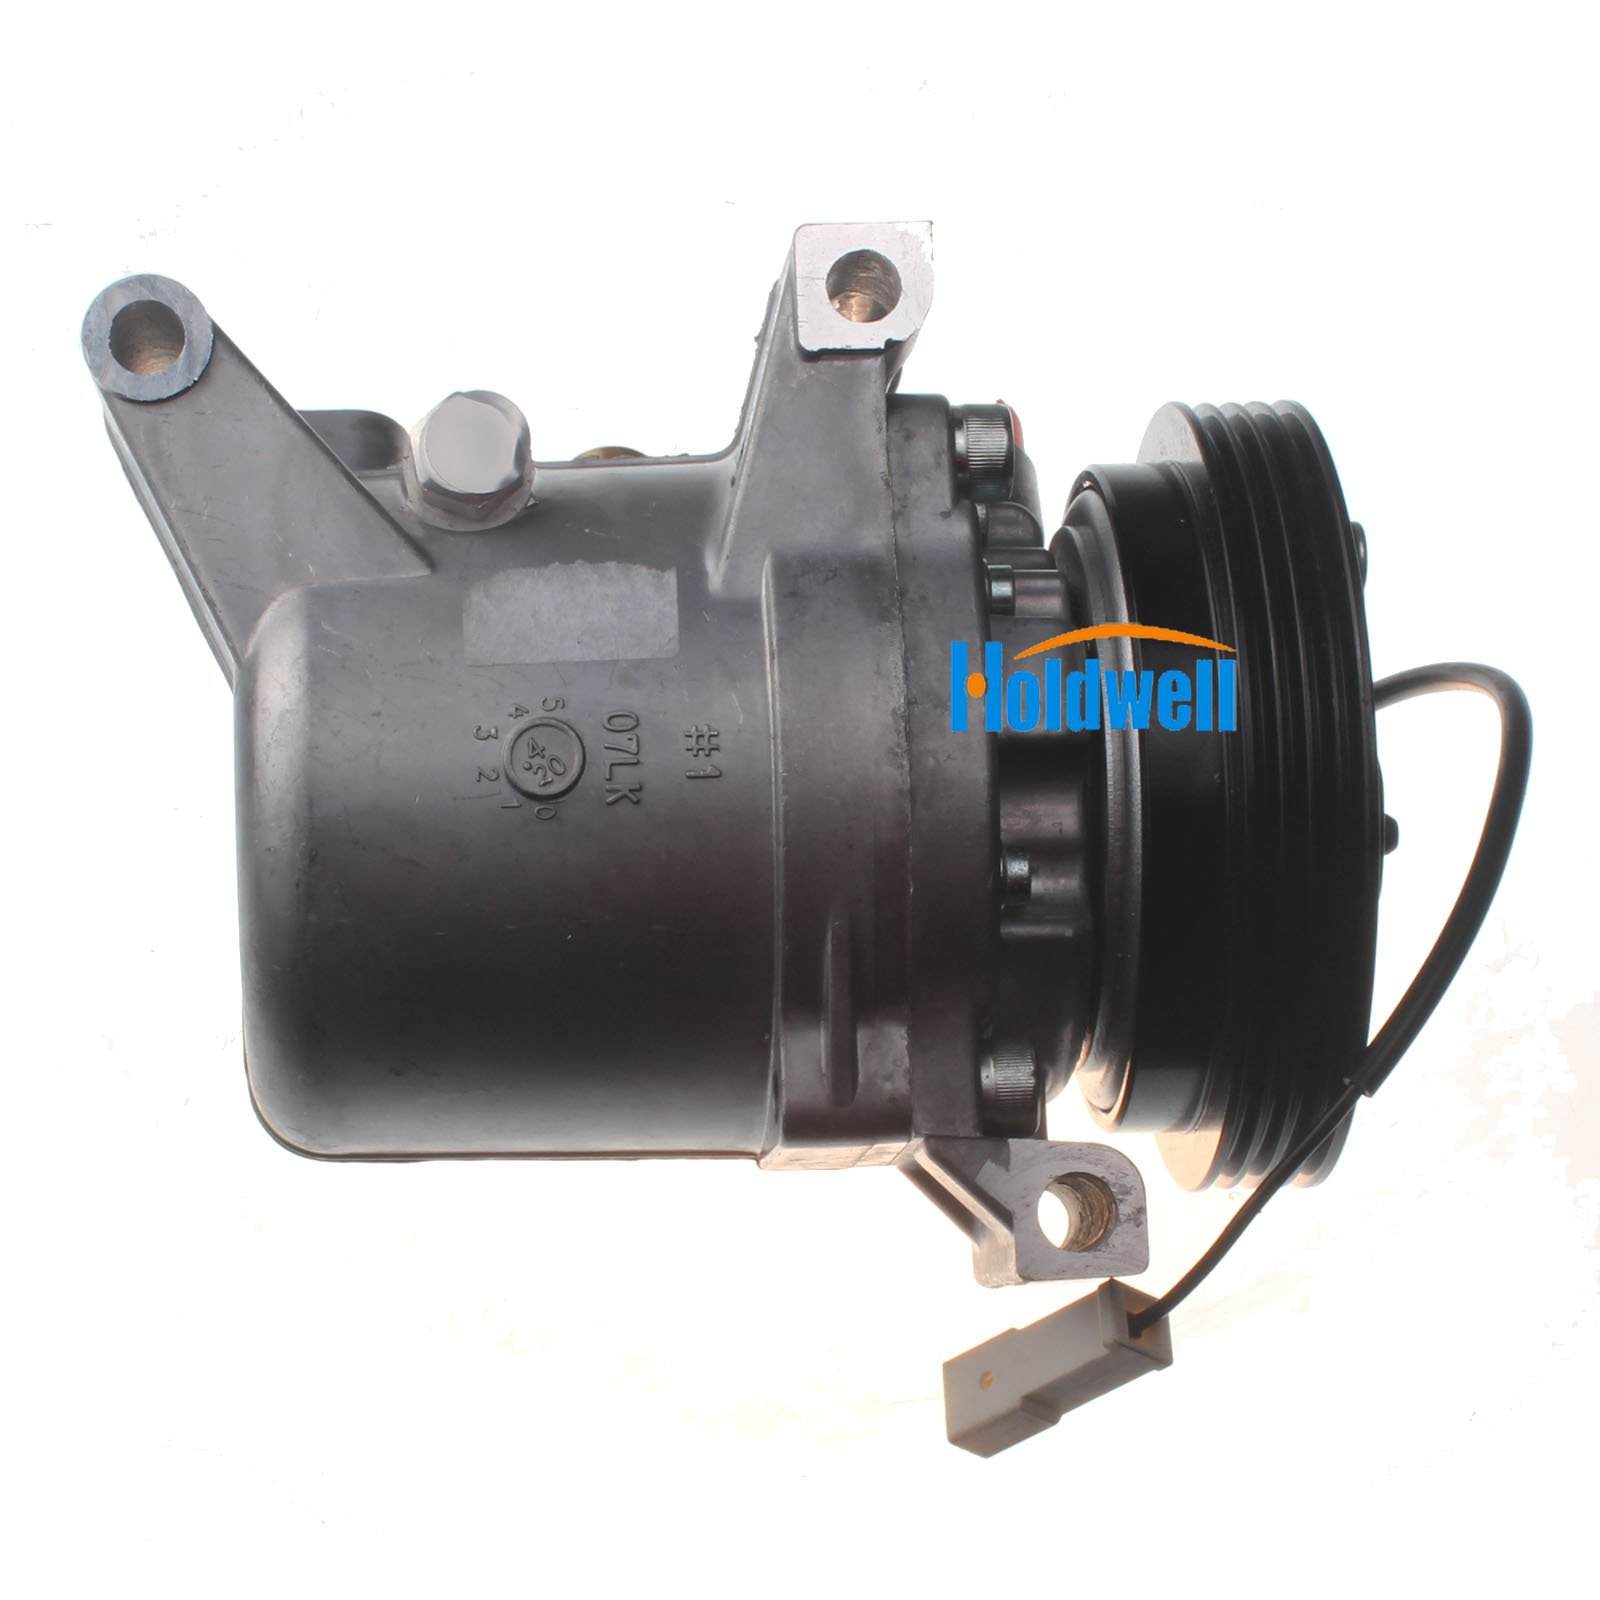 Holdwell Auto AC Compressor 95201-77GB2 9520177GB2 for Suzuki Jimny Seiko Seiki SS07LK10 by Holdwell (Image #7)